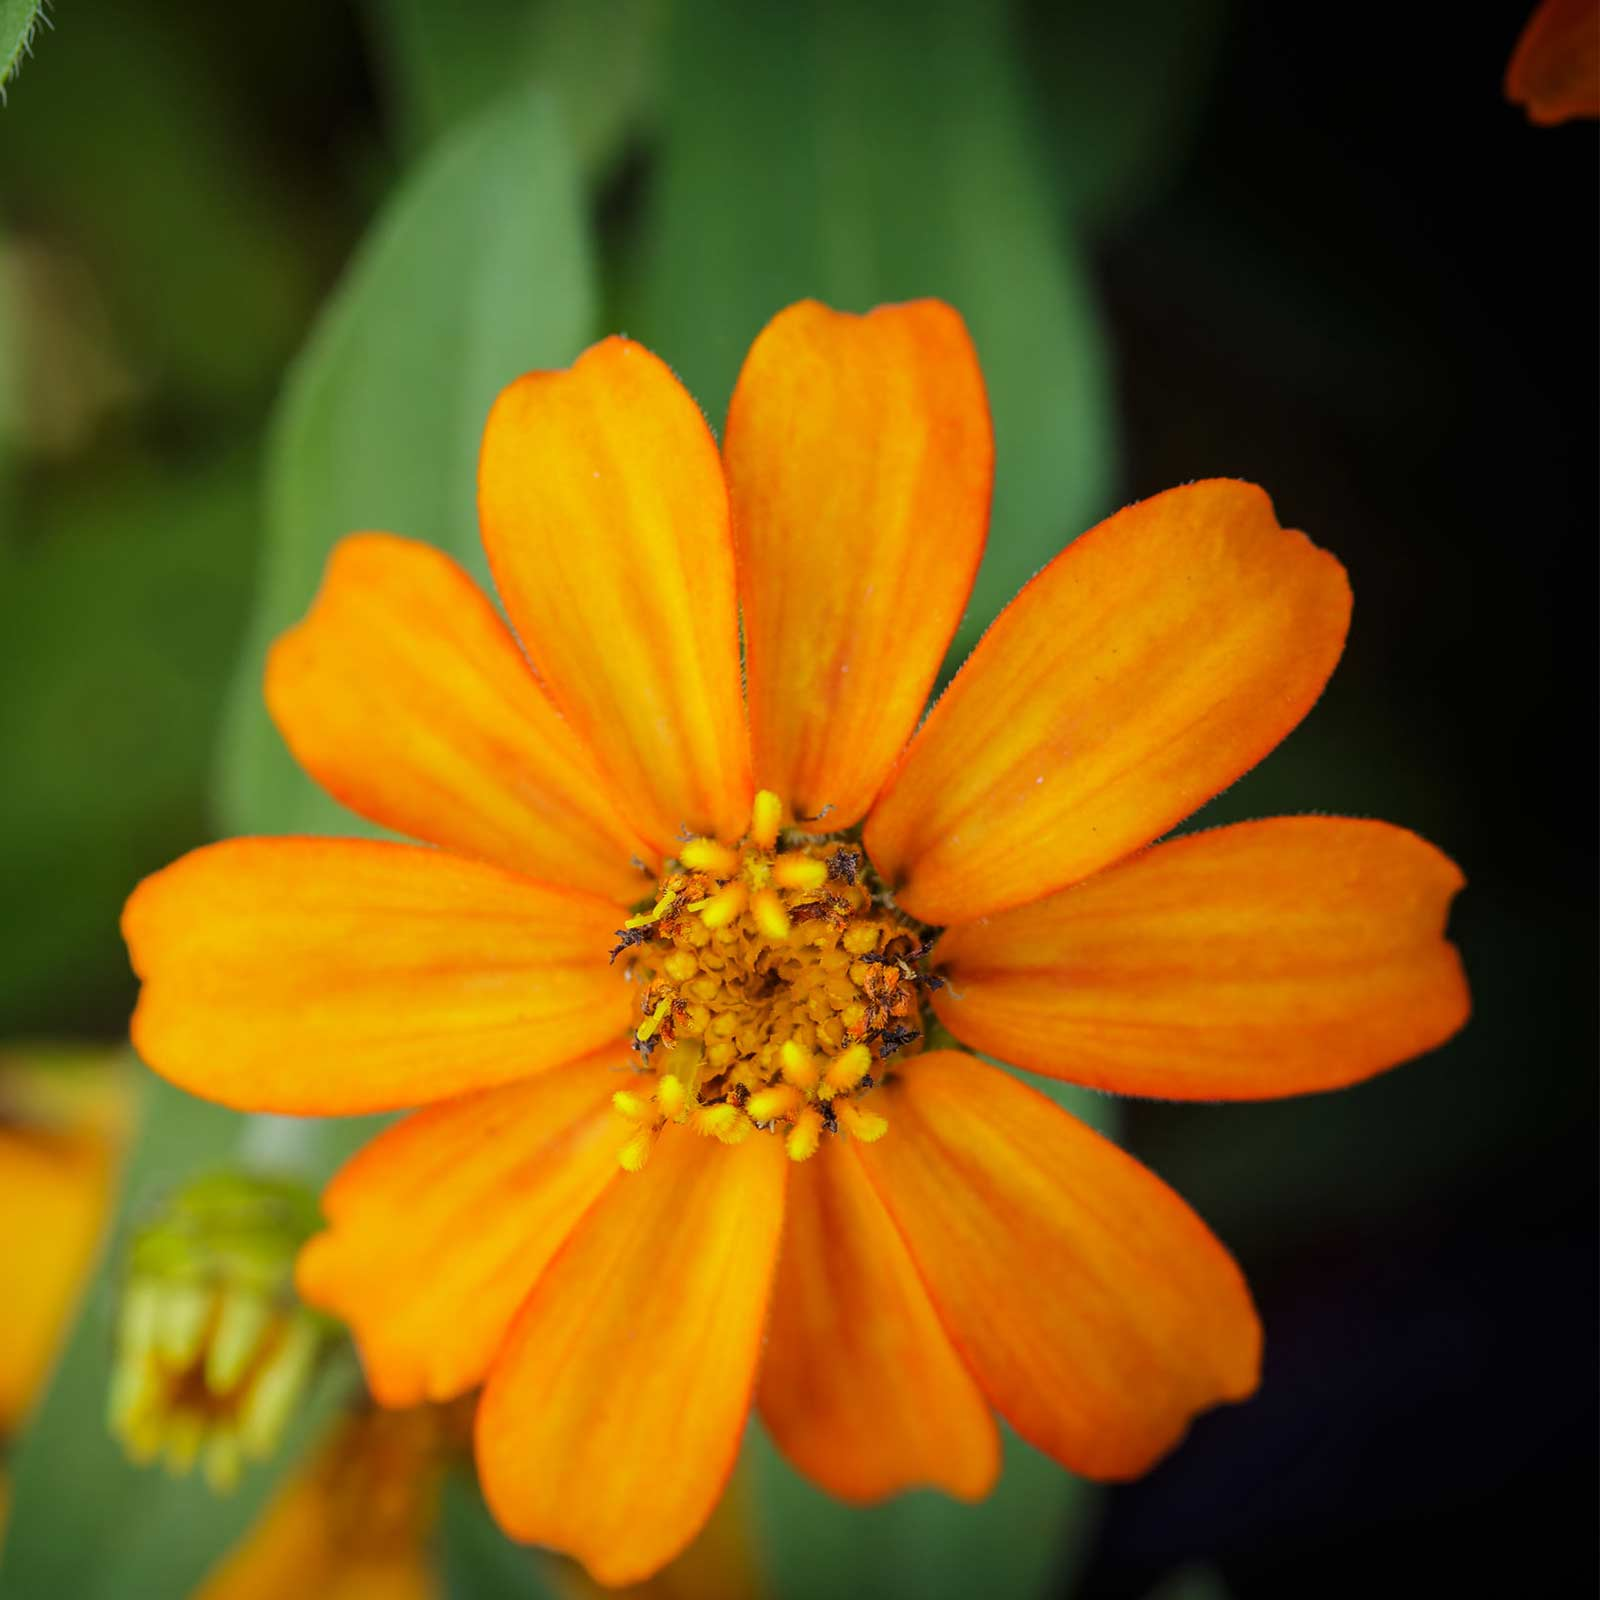 Zinnia Flower Garden Seeds - Cyrstal Series - Orange - 500 Seeds - Annual Flower Gardening Seed